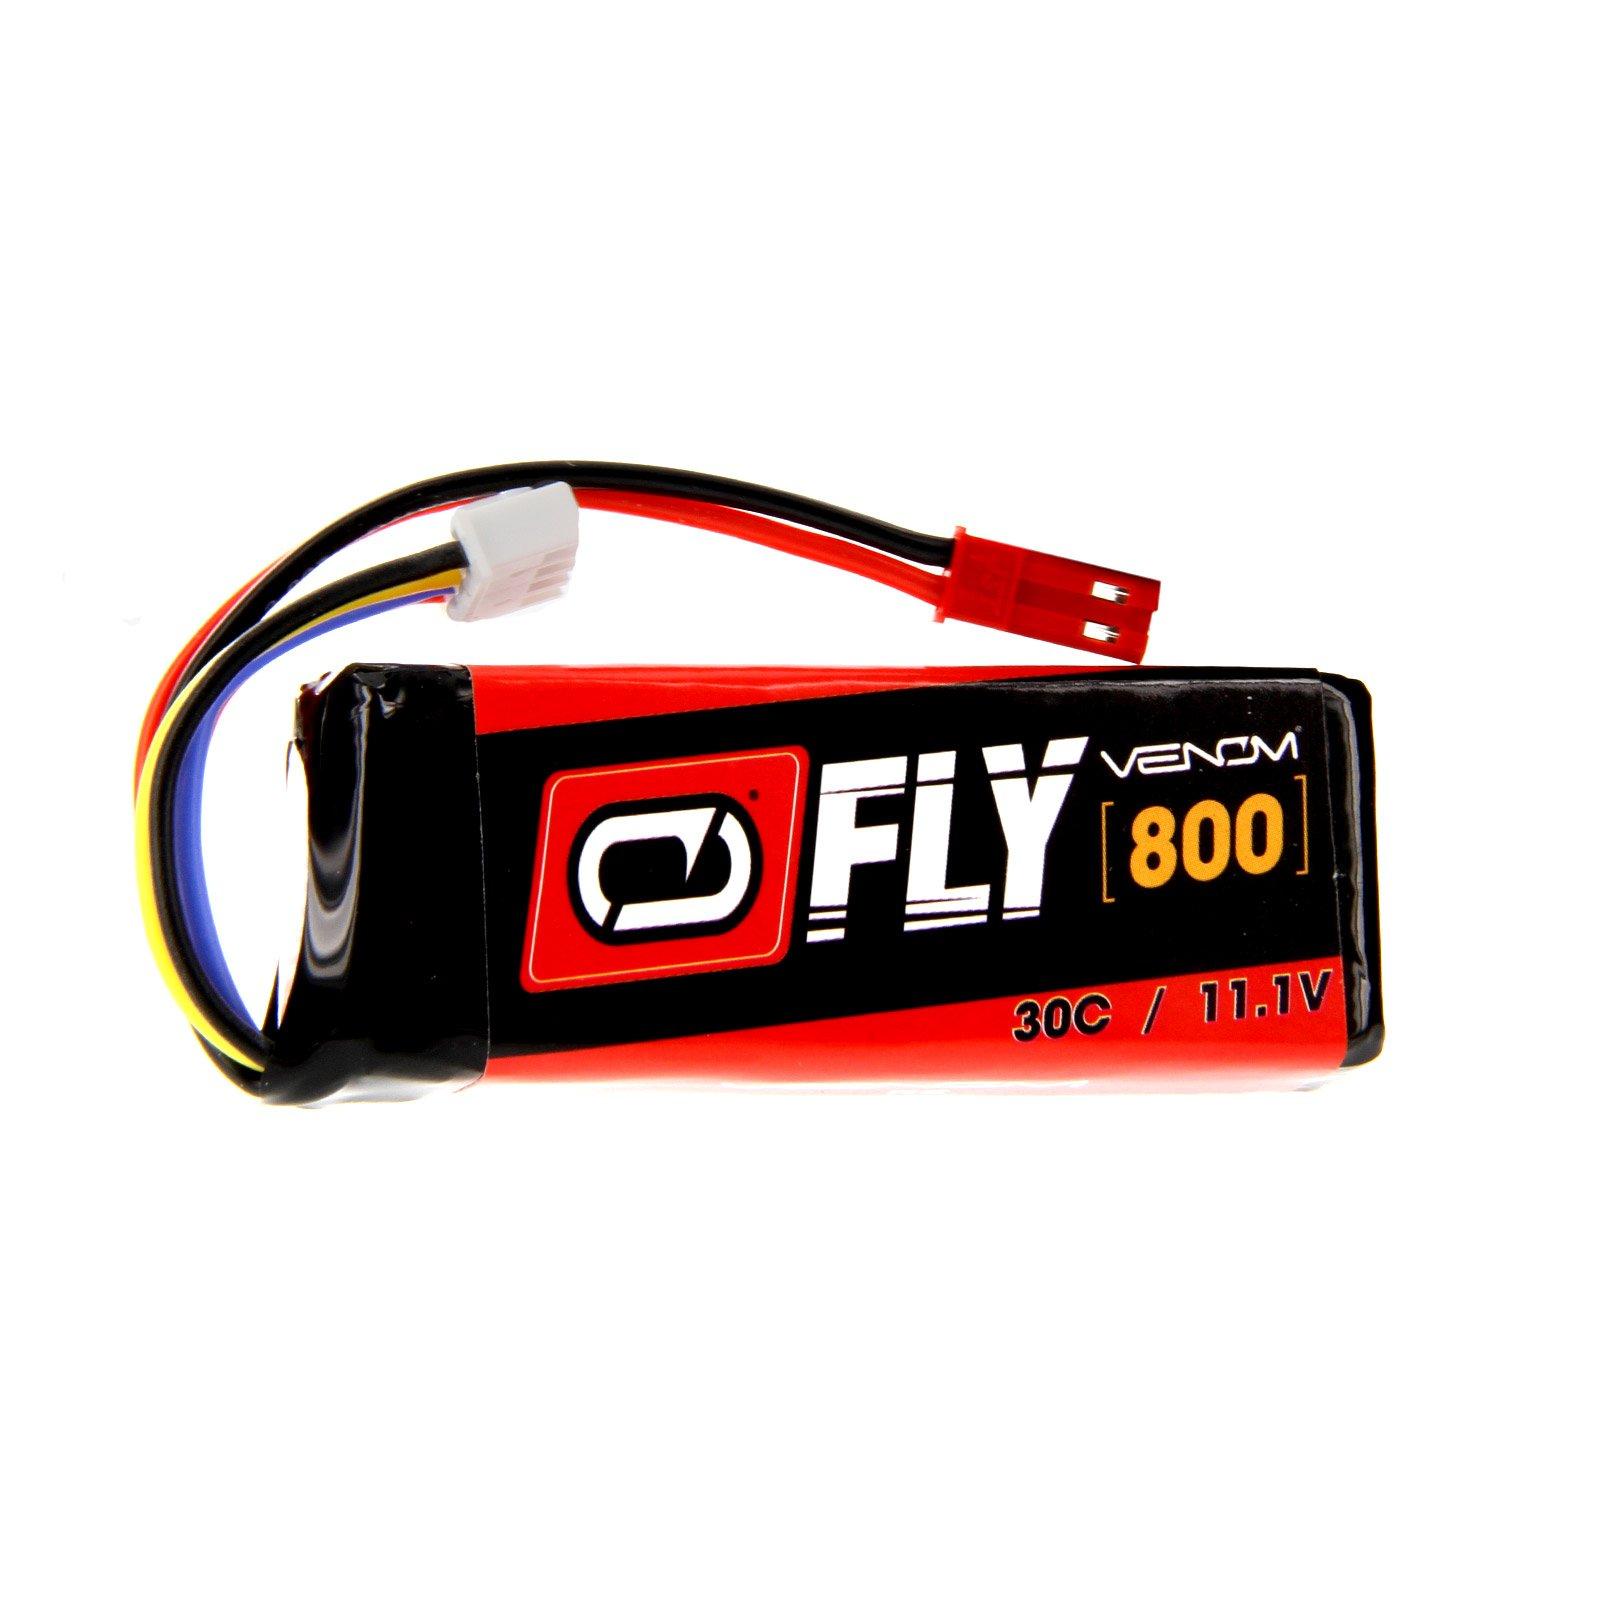 Venom Fly 30C 3S 800mAh 11.1V LiPo Battery with JST Plug - Compare to E-flite EFLB8003SJ30